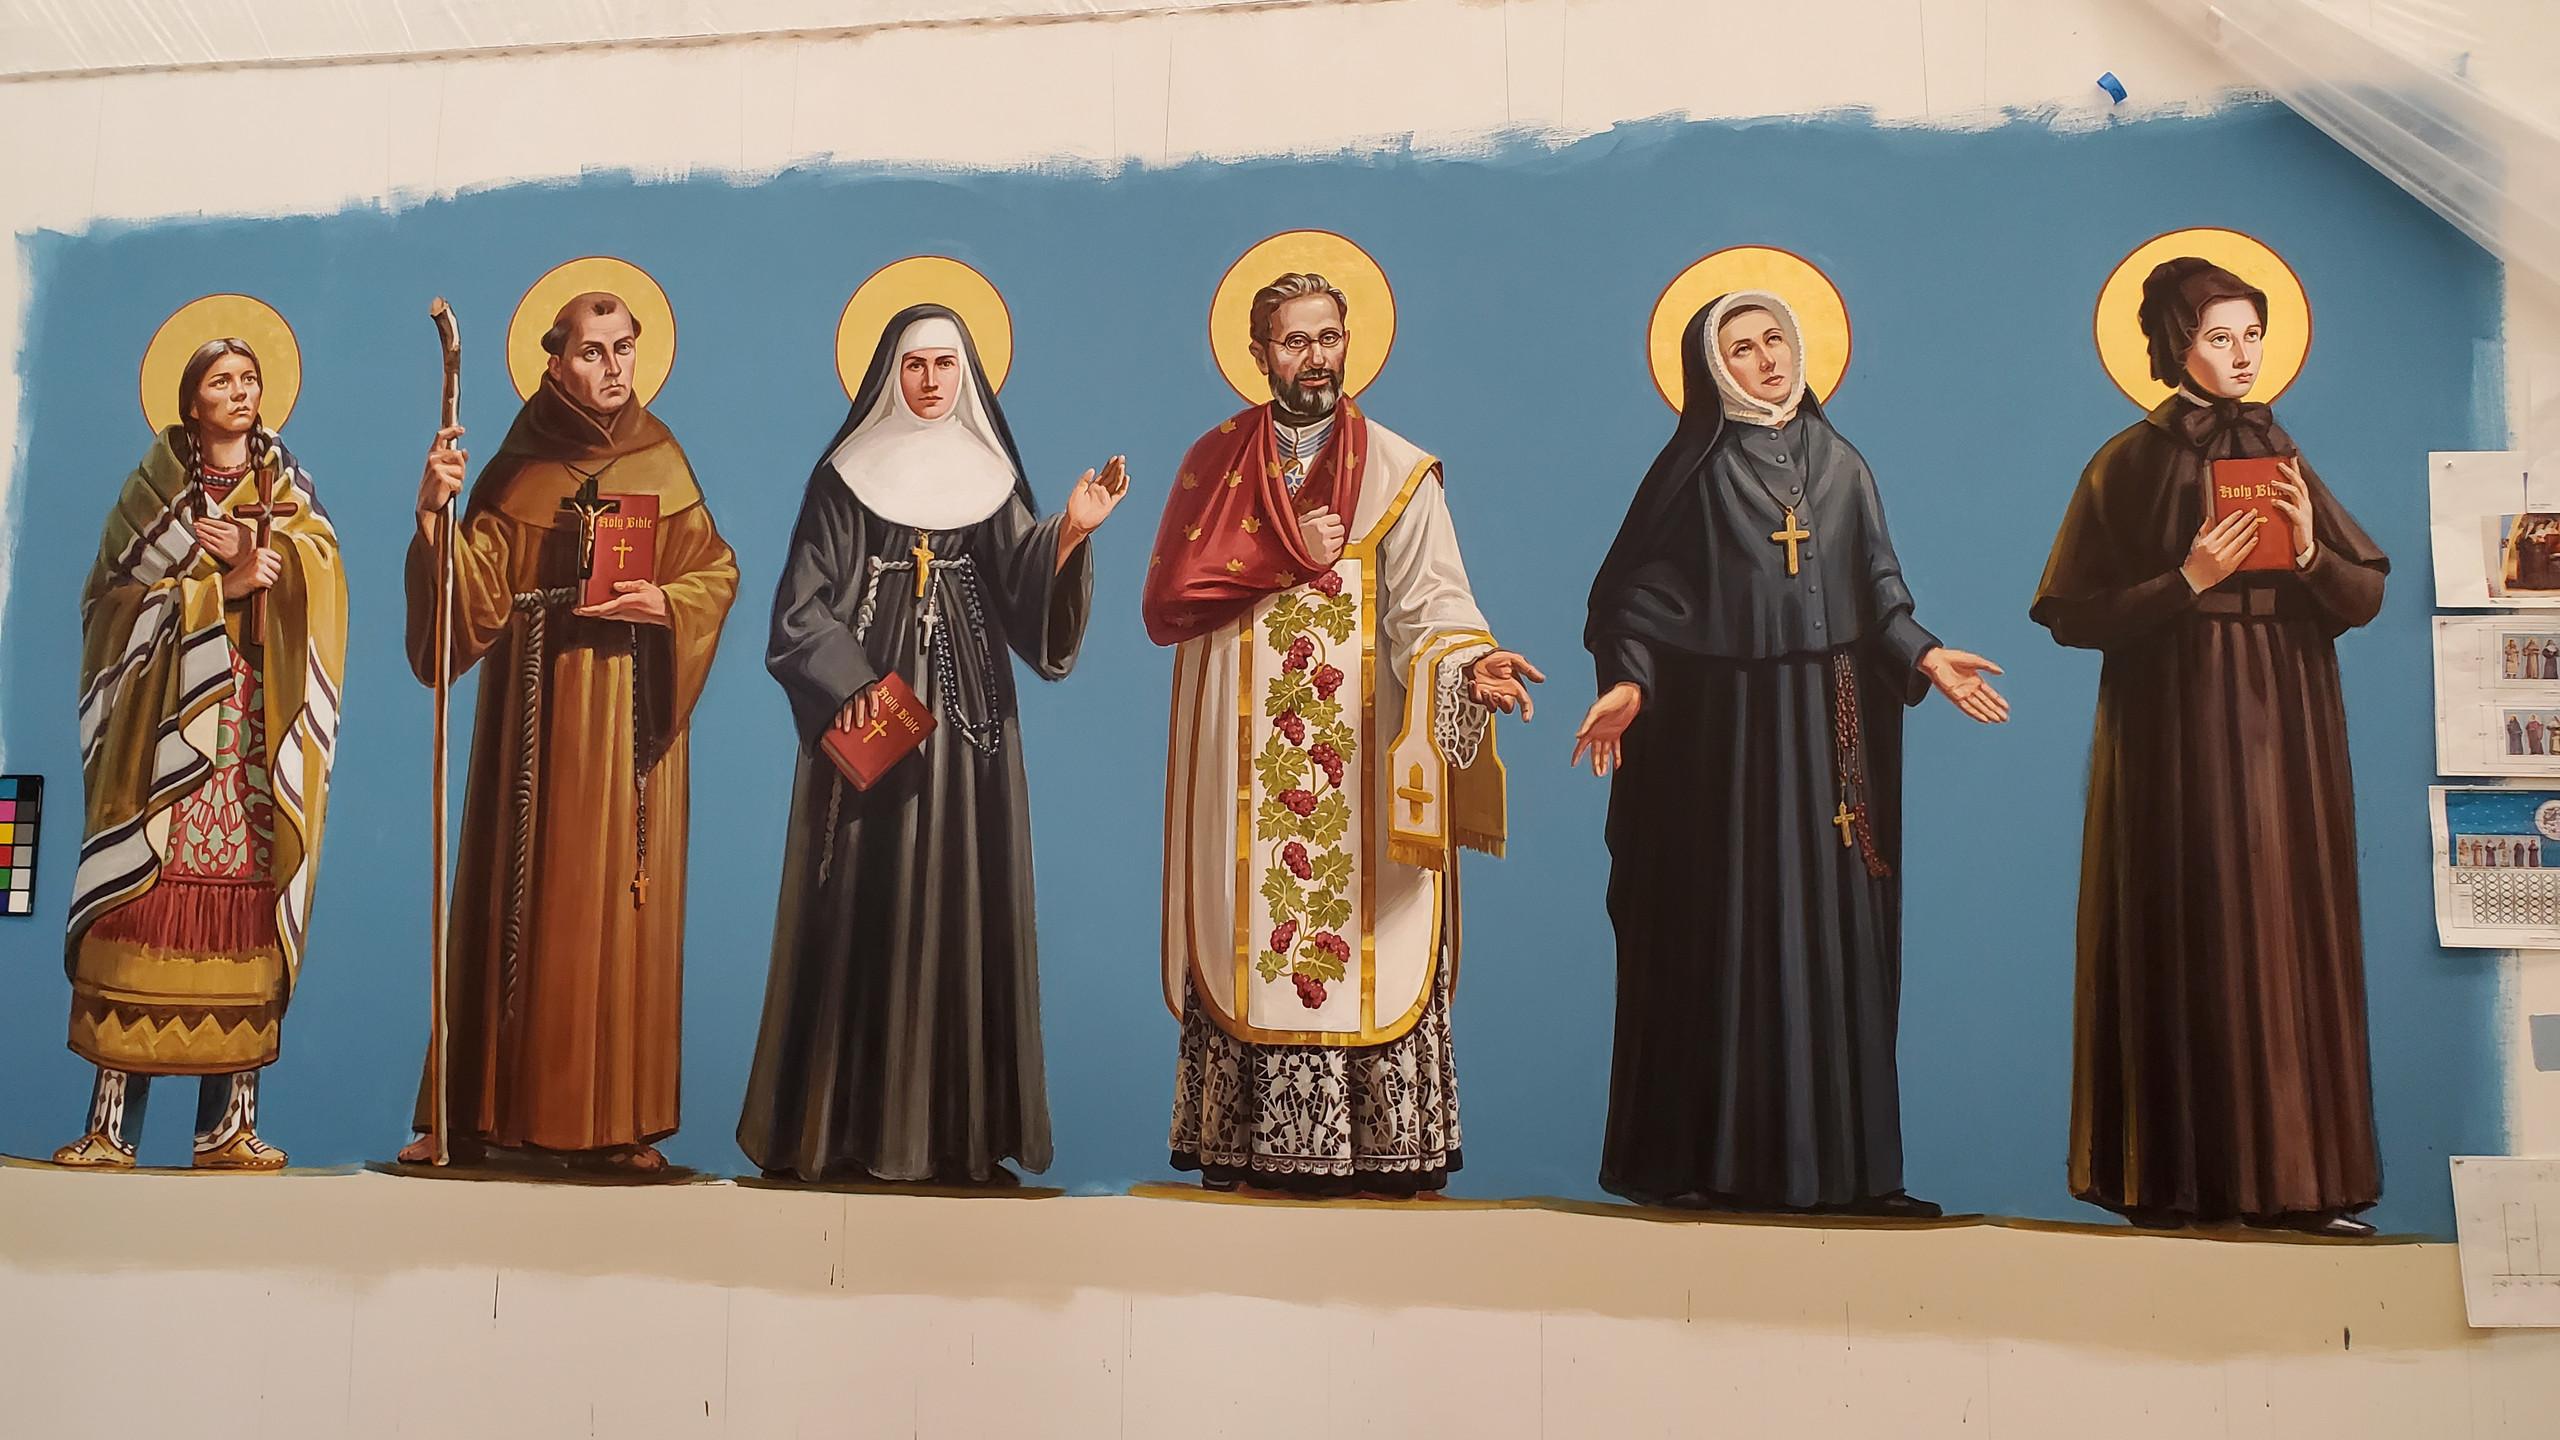 Mural project for St. Elizabeth Ann Seton Catholic Church, Fort Collins, CO